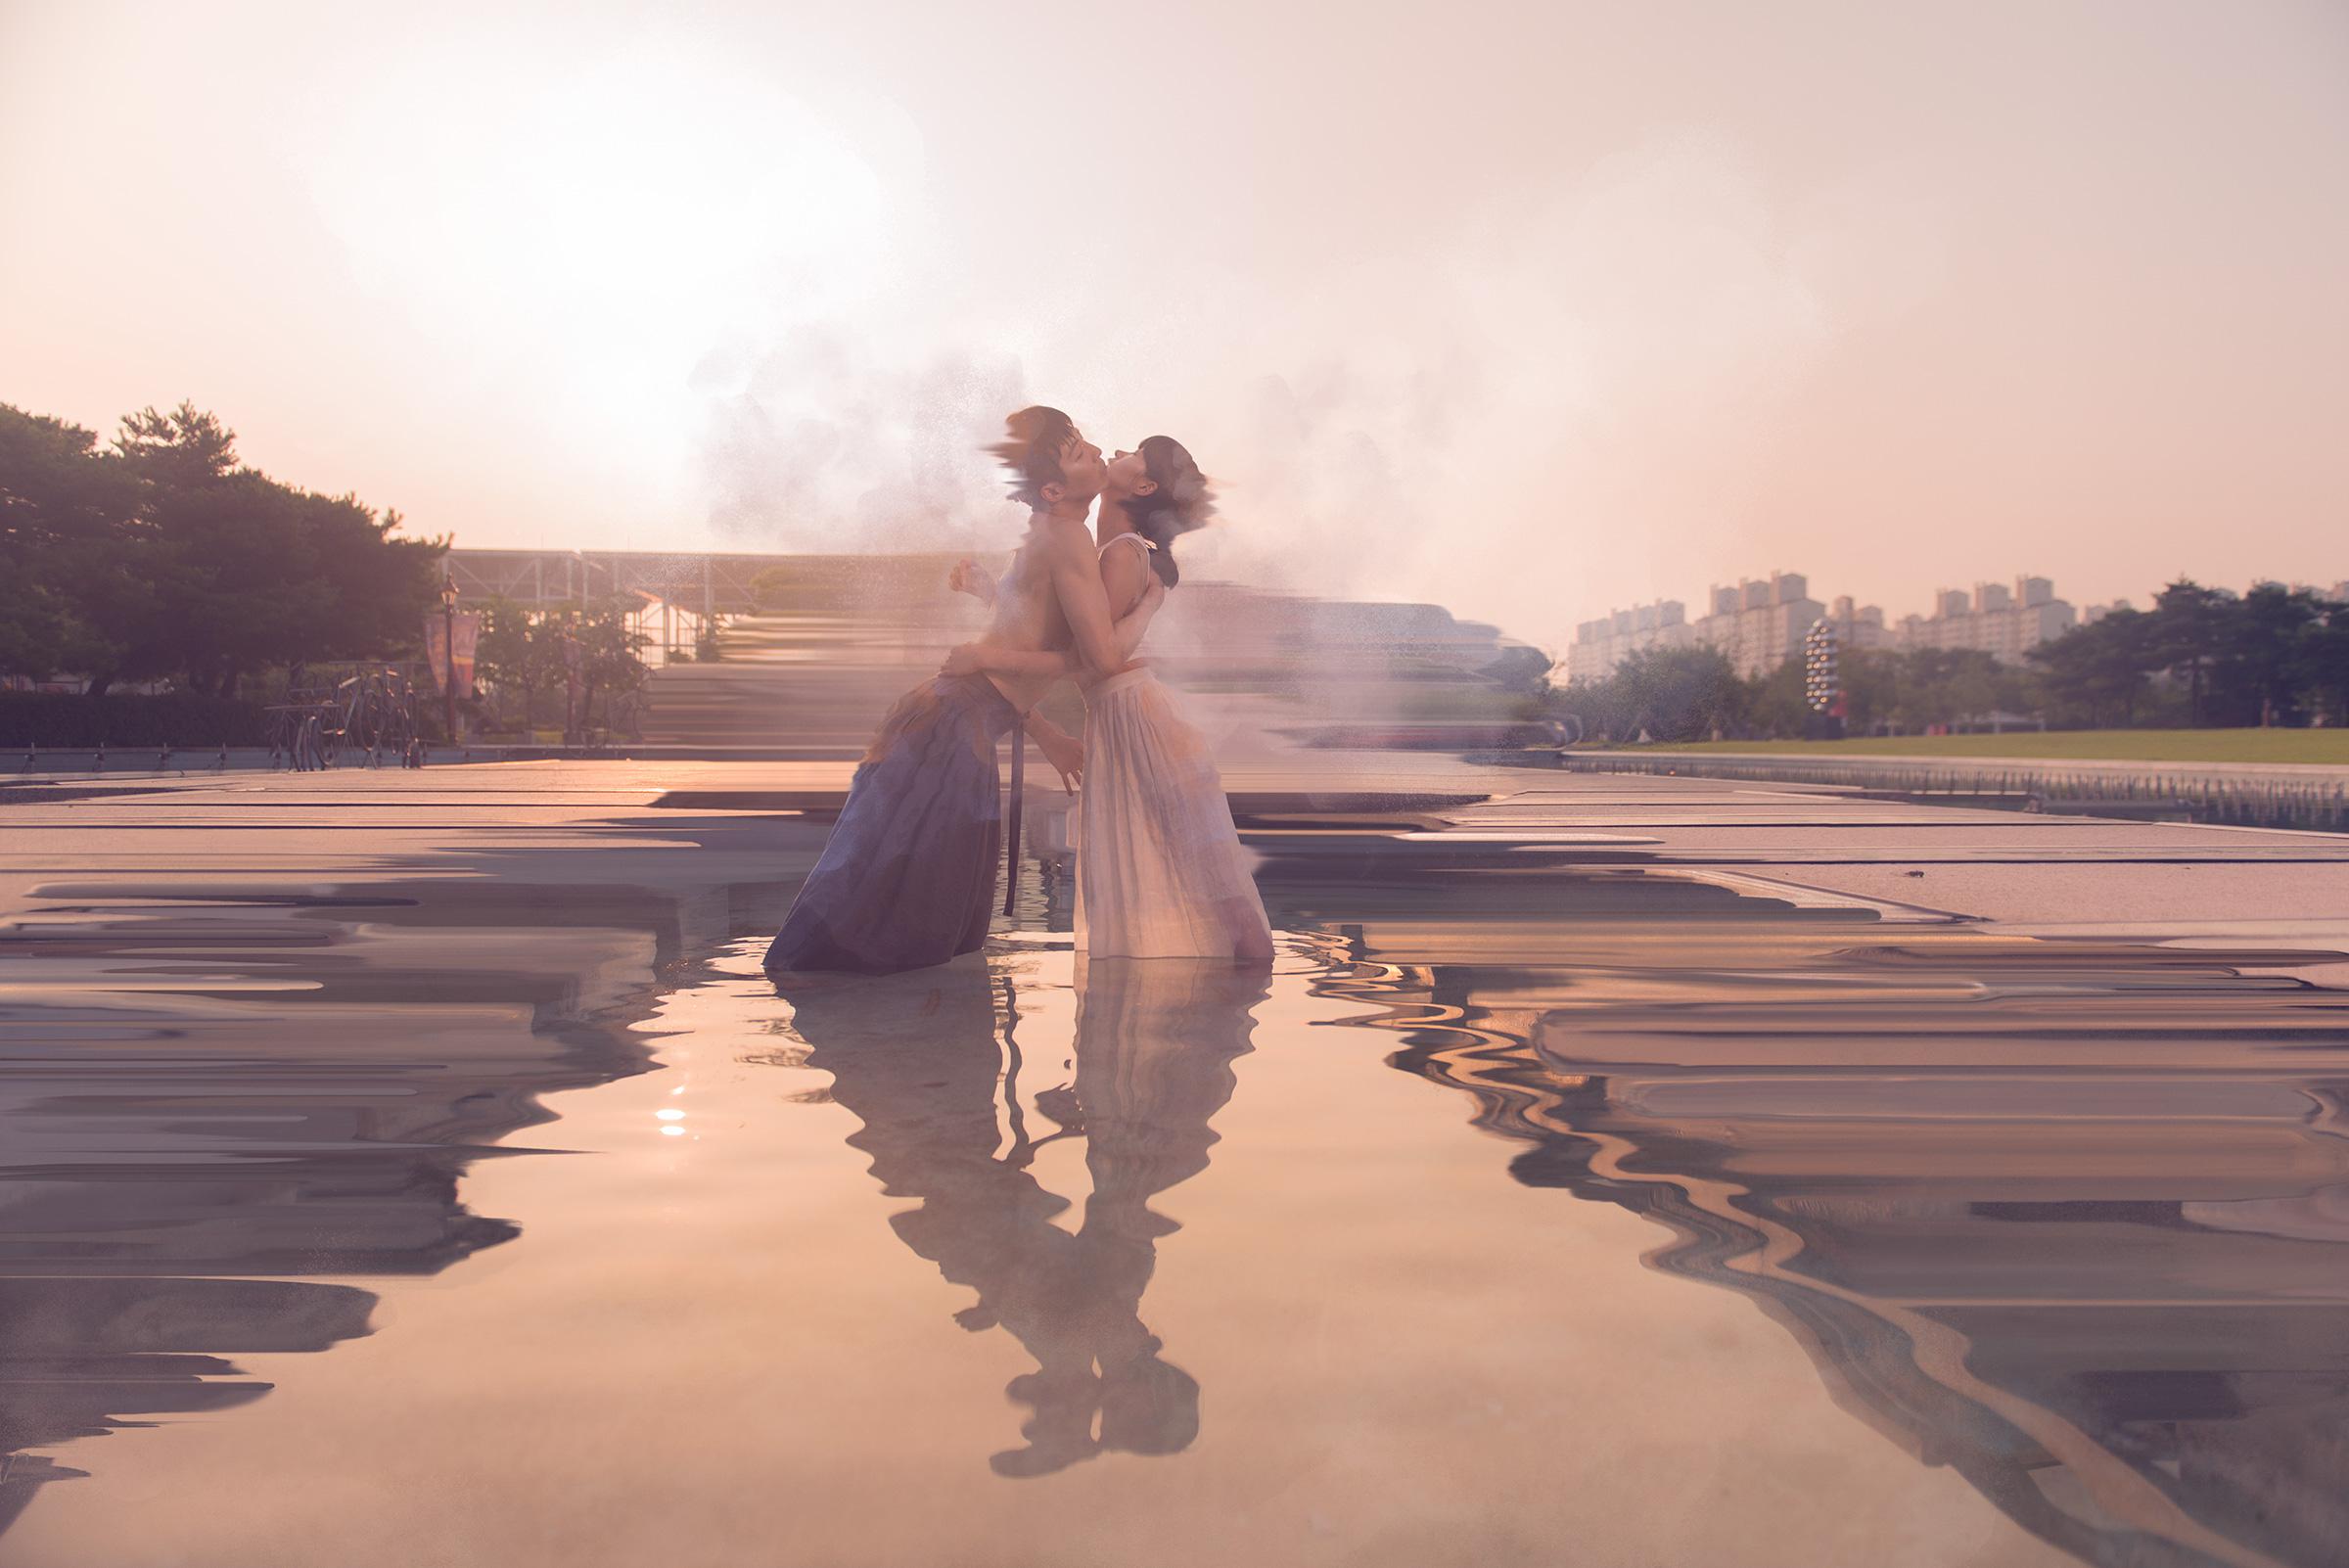 Dancers: Hyelim Kang & Yunshin Seo